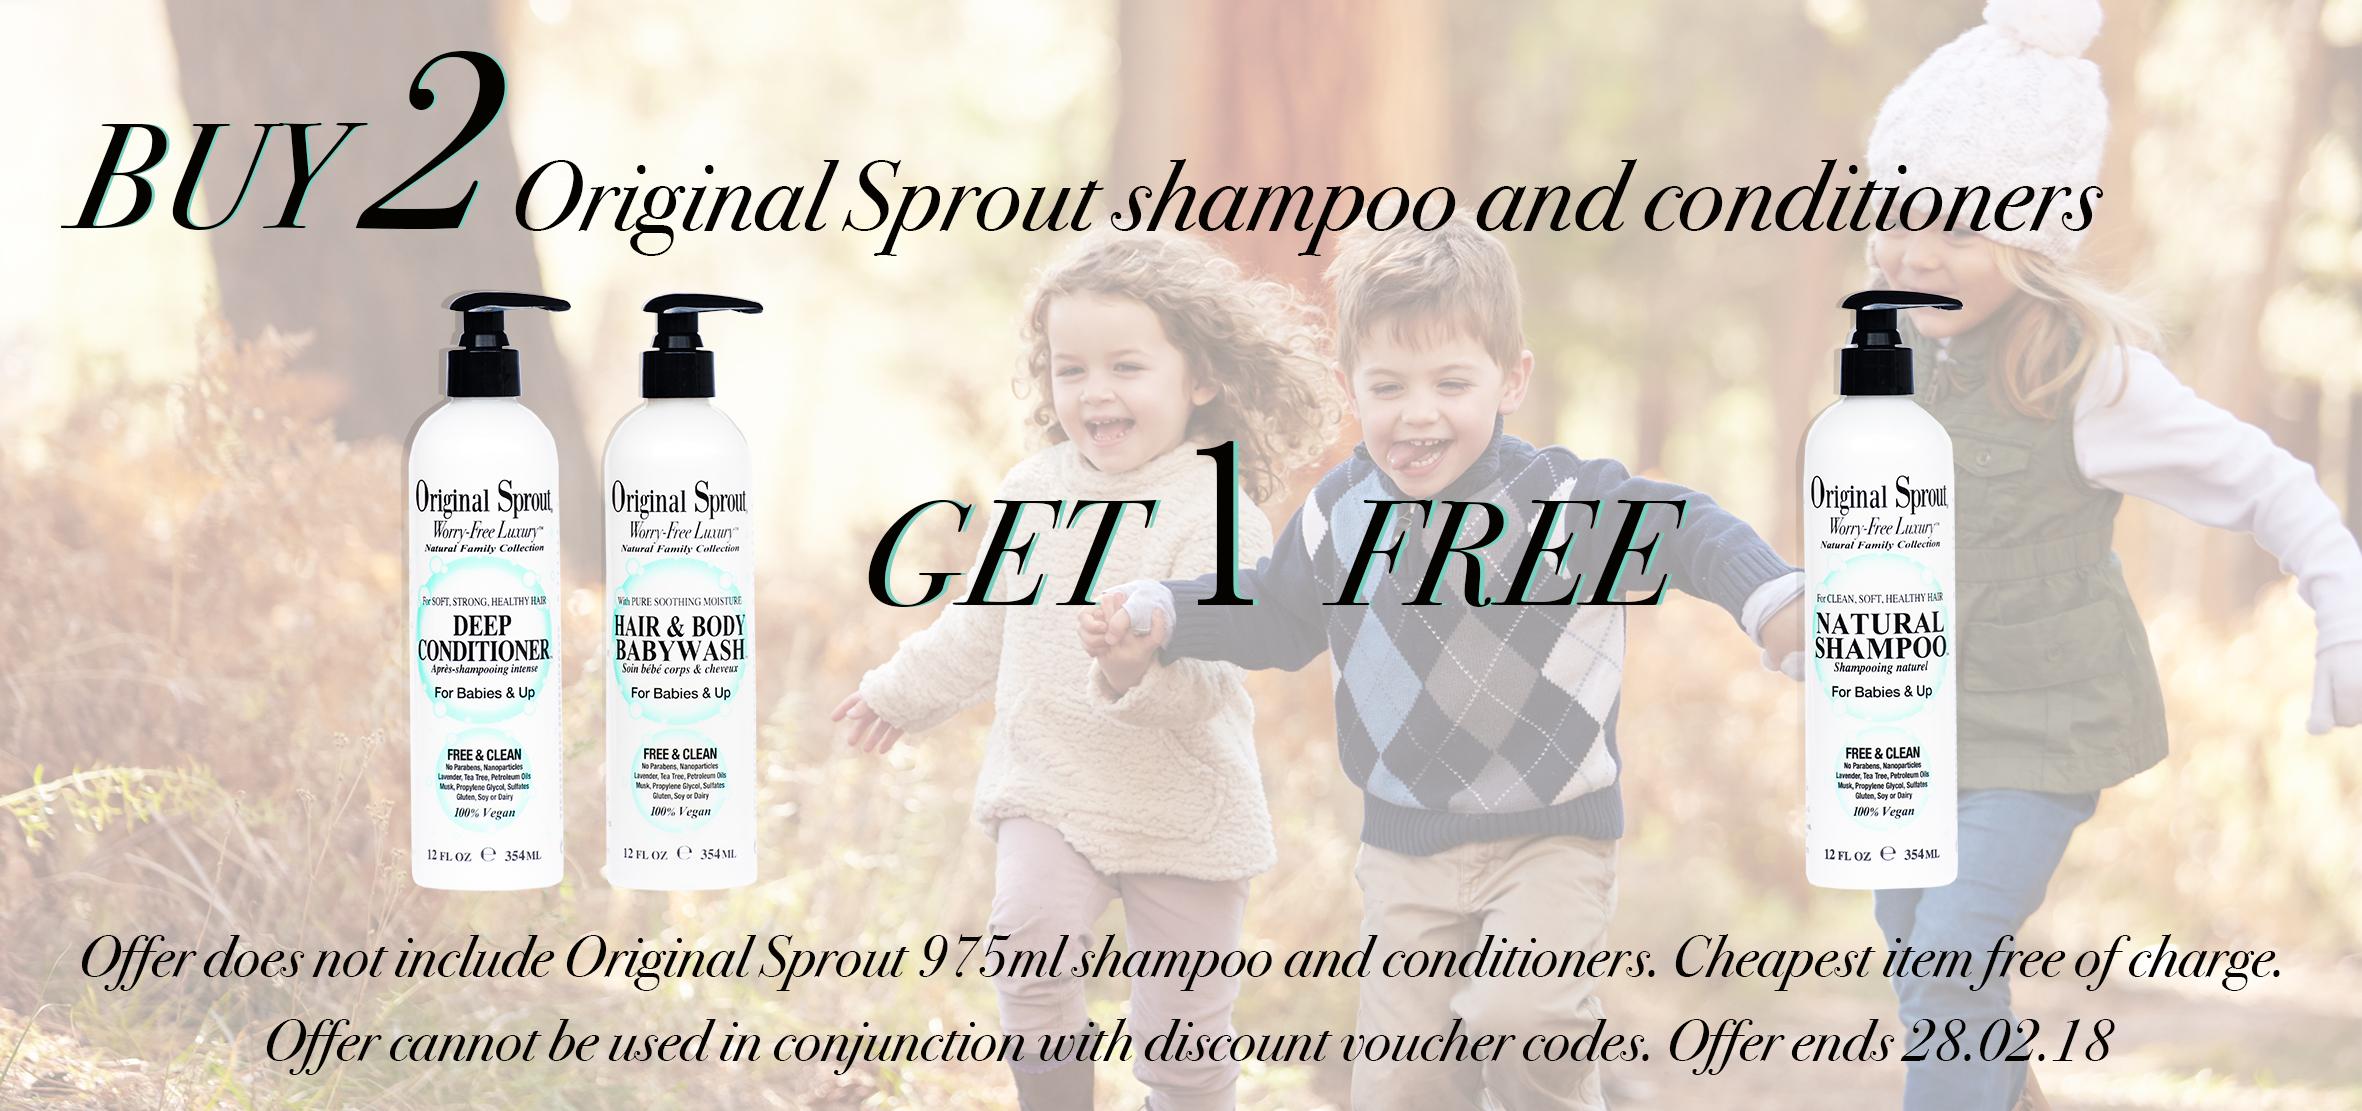 Buy-2-get-1-free-shampoo-3